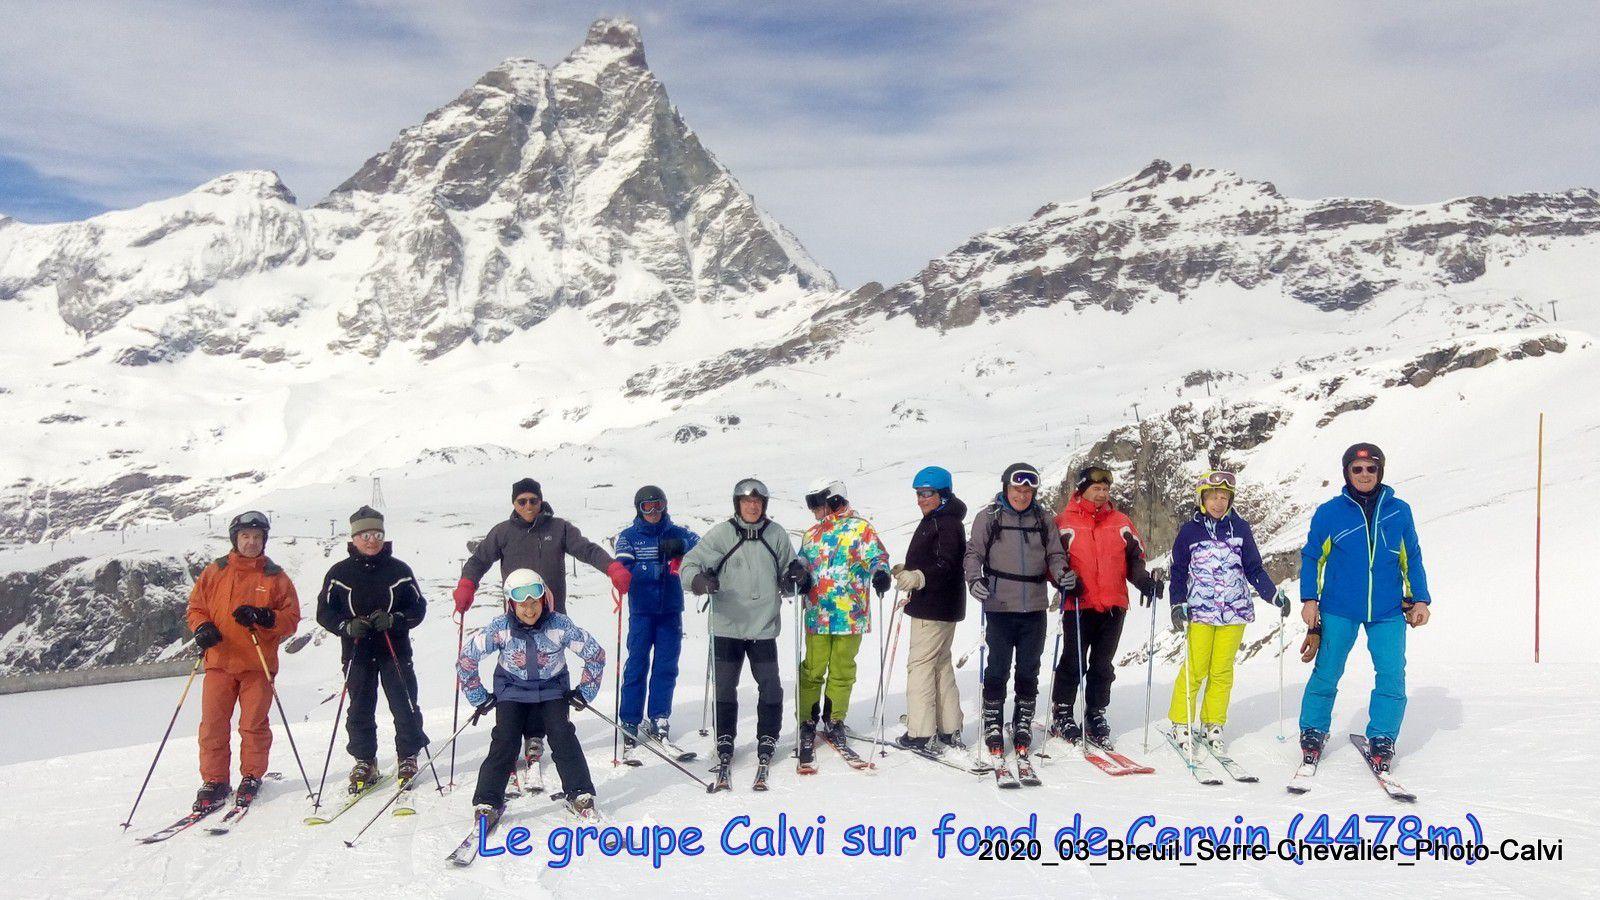 Séjour ski Breuil-Cervinia/Serre-Chevalier mars 2020